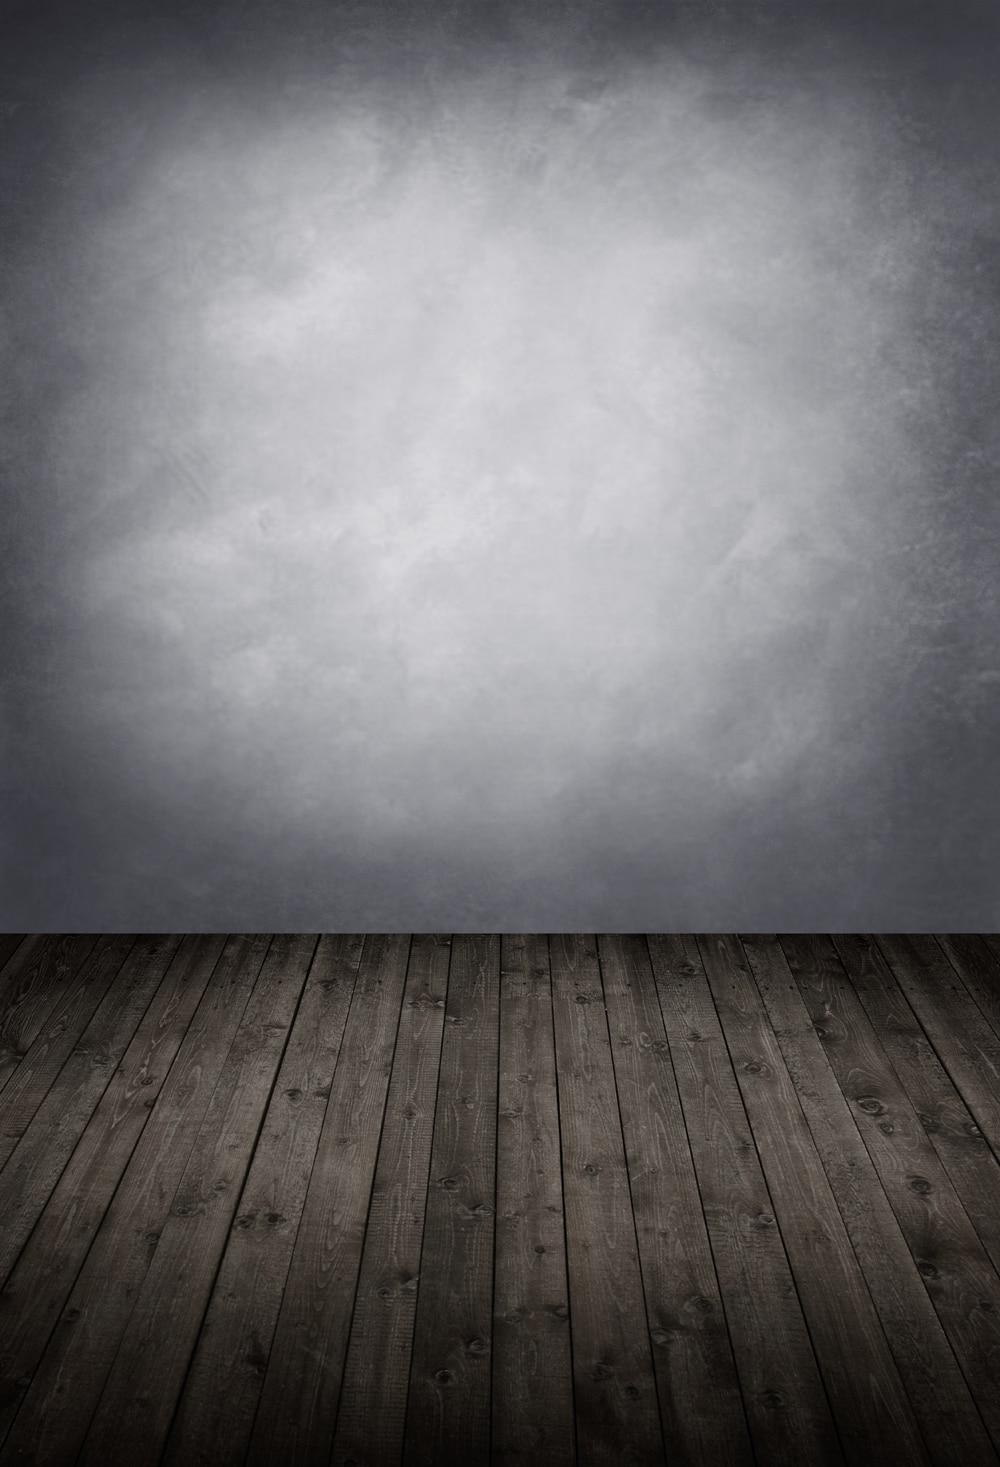 Dark Gray vinyl backdrop Solid backdrop background photo background  wooden planks photo studio background XT-6507